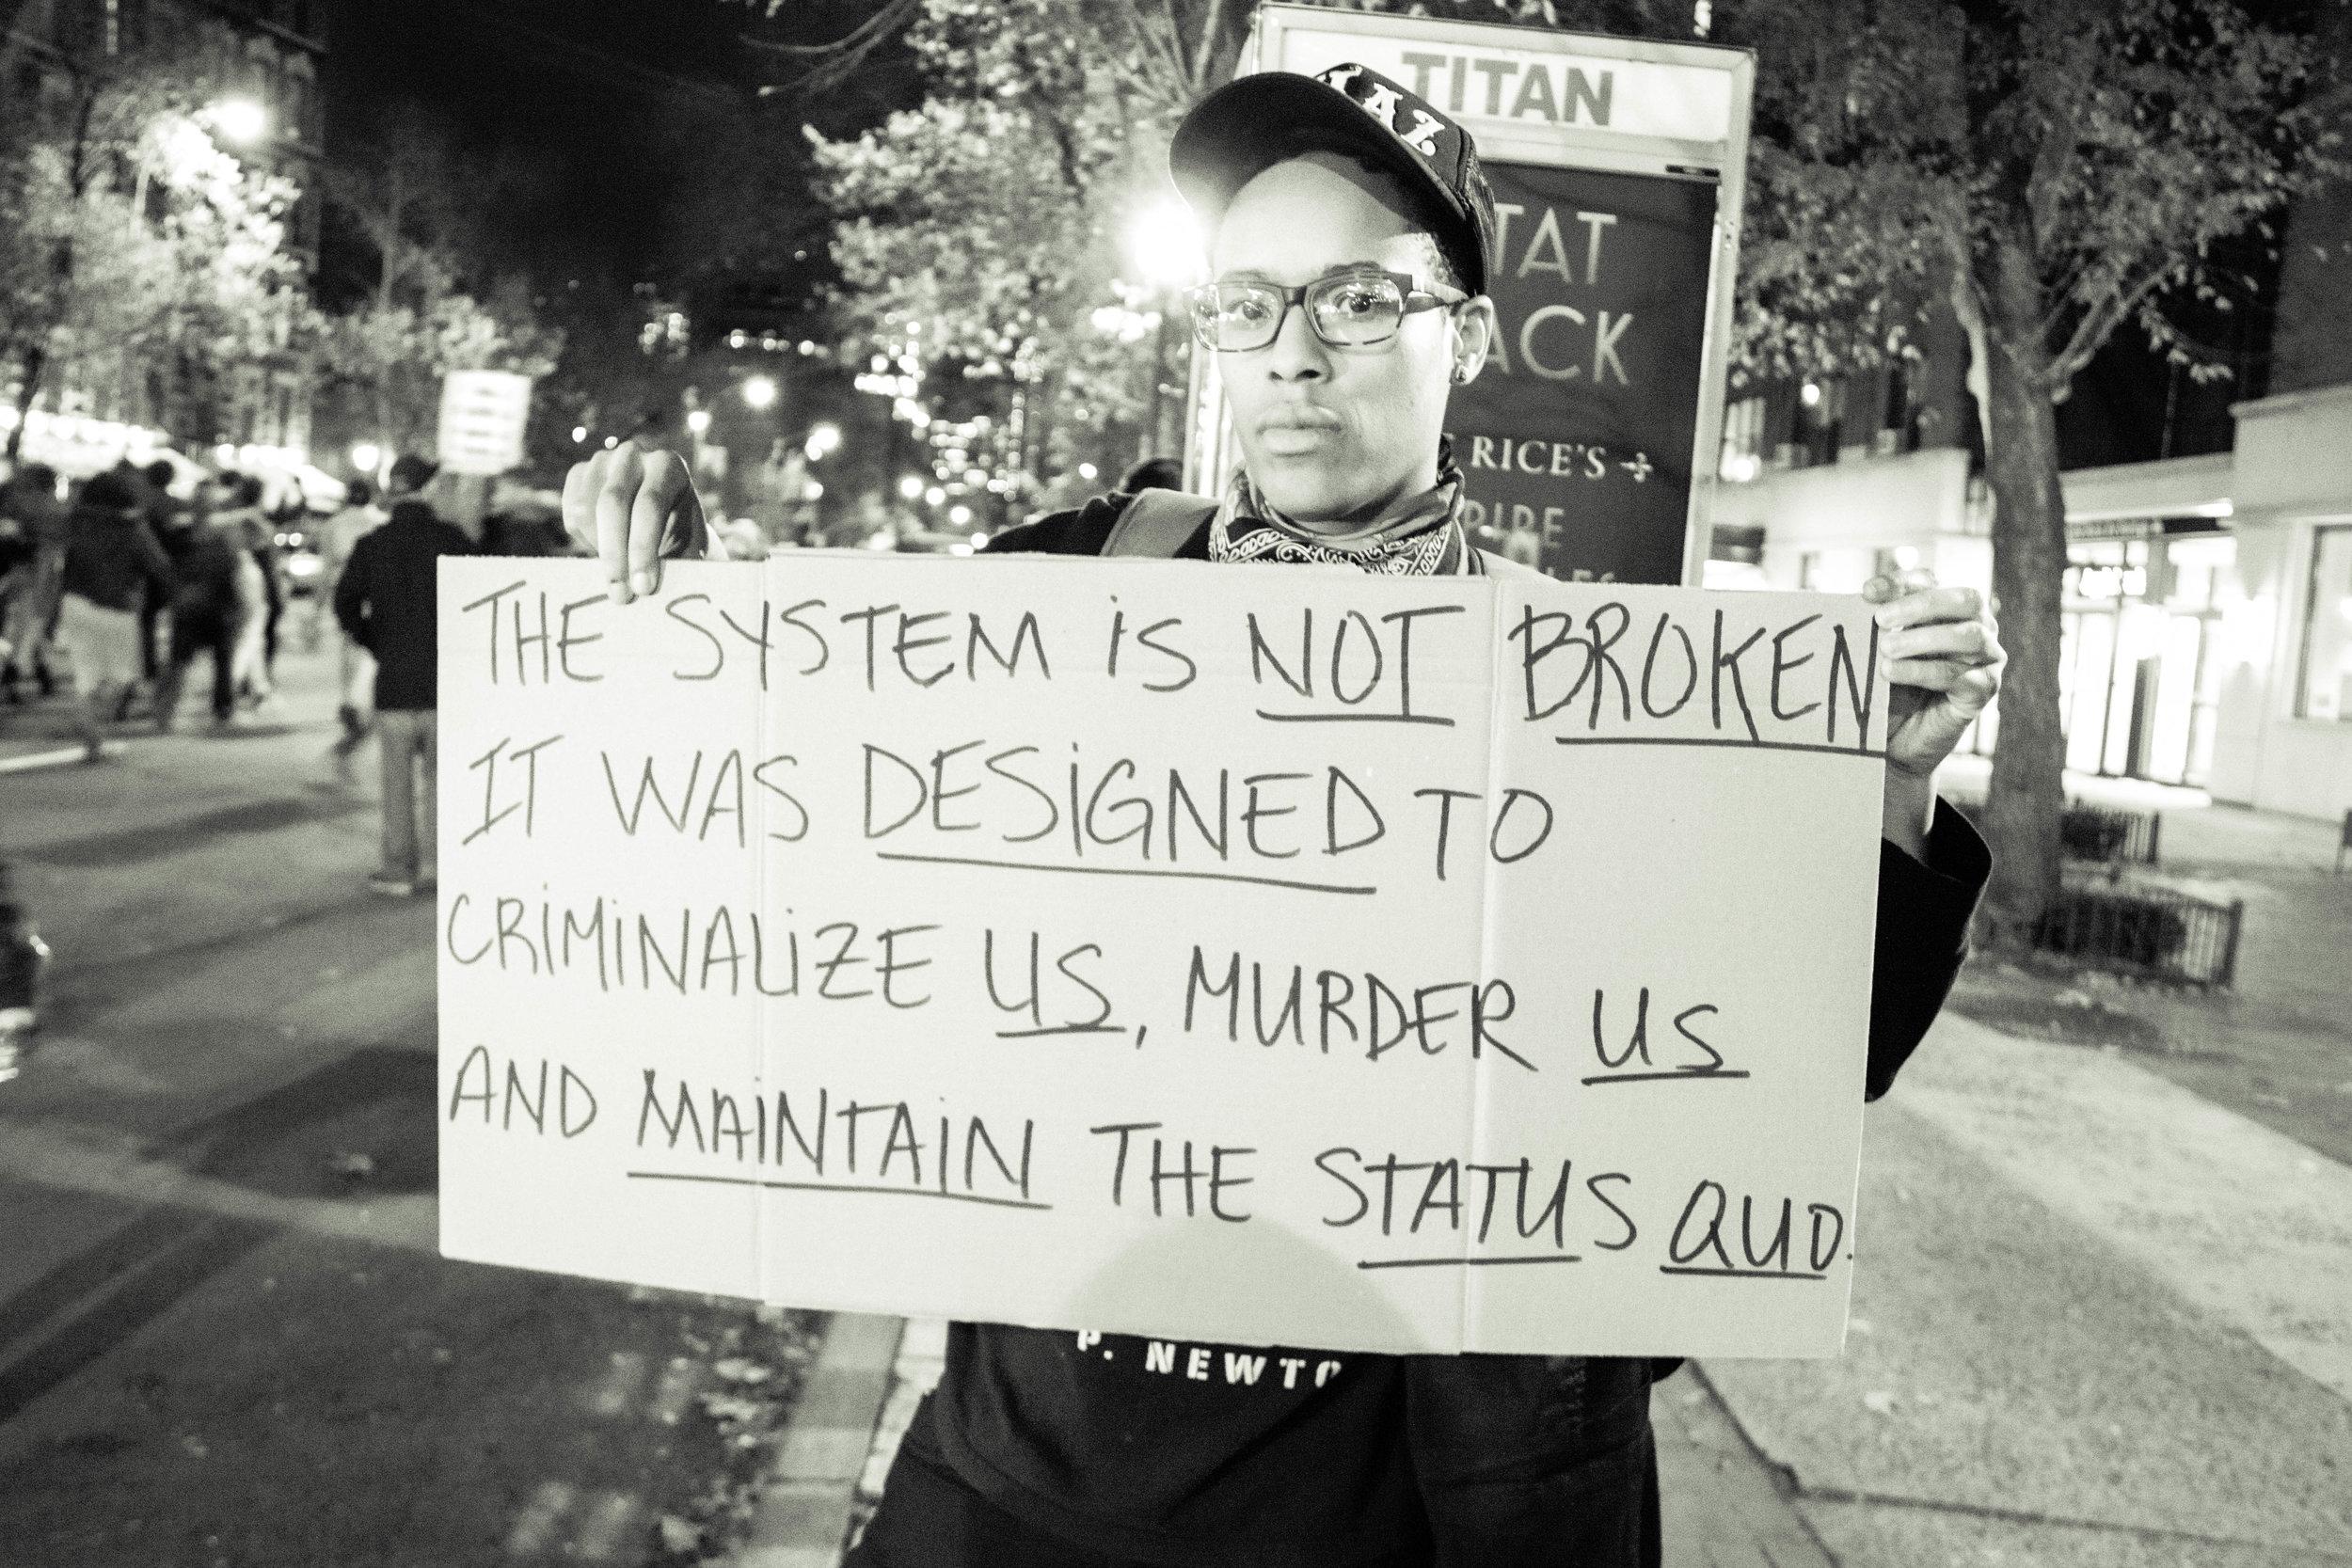 Black Lives Matter, New York, NY, February 2015